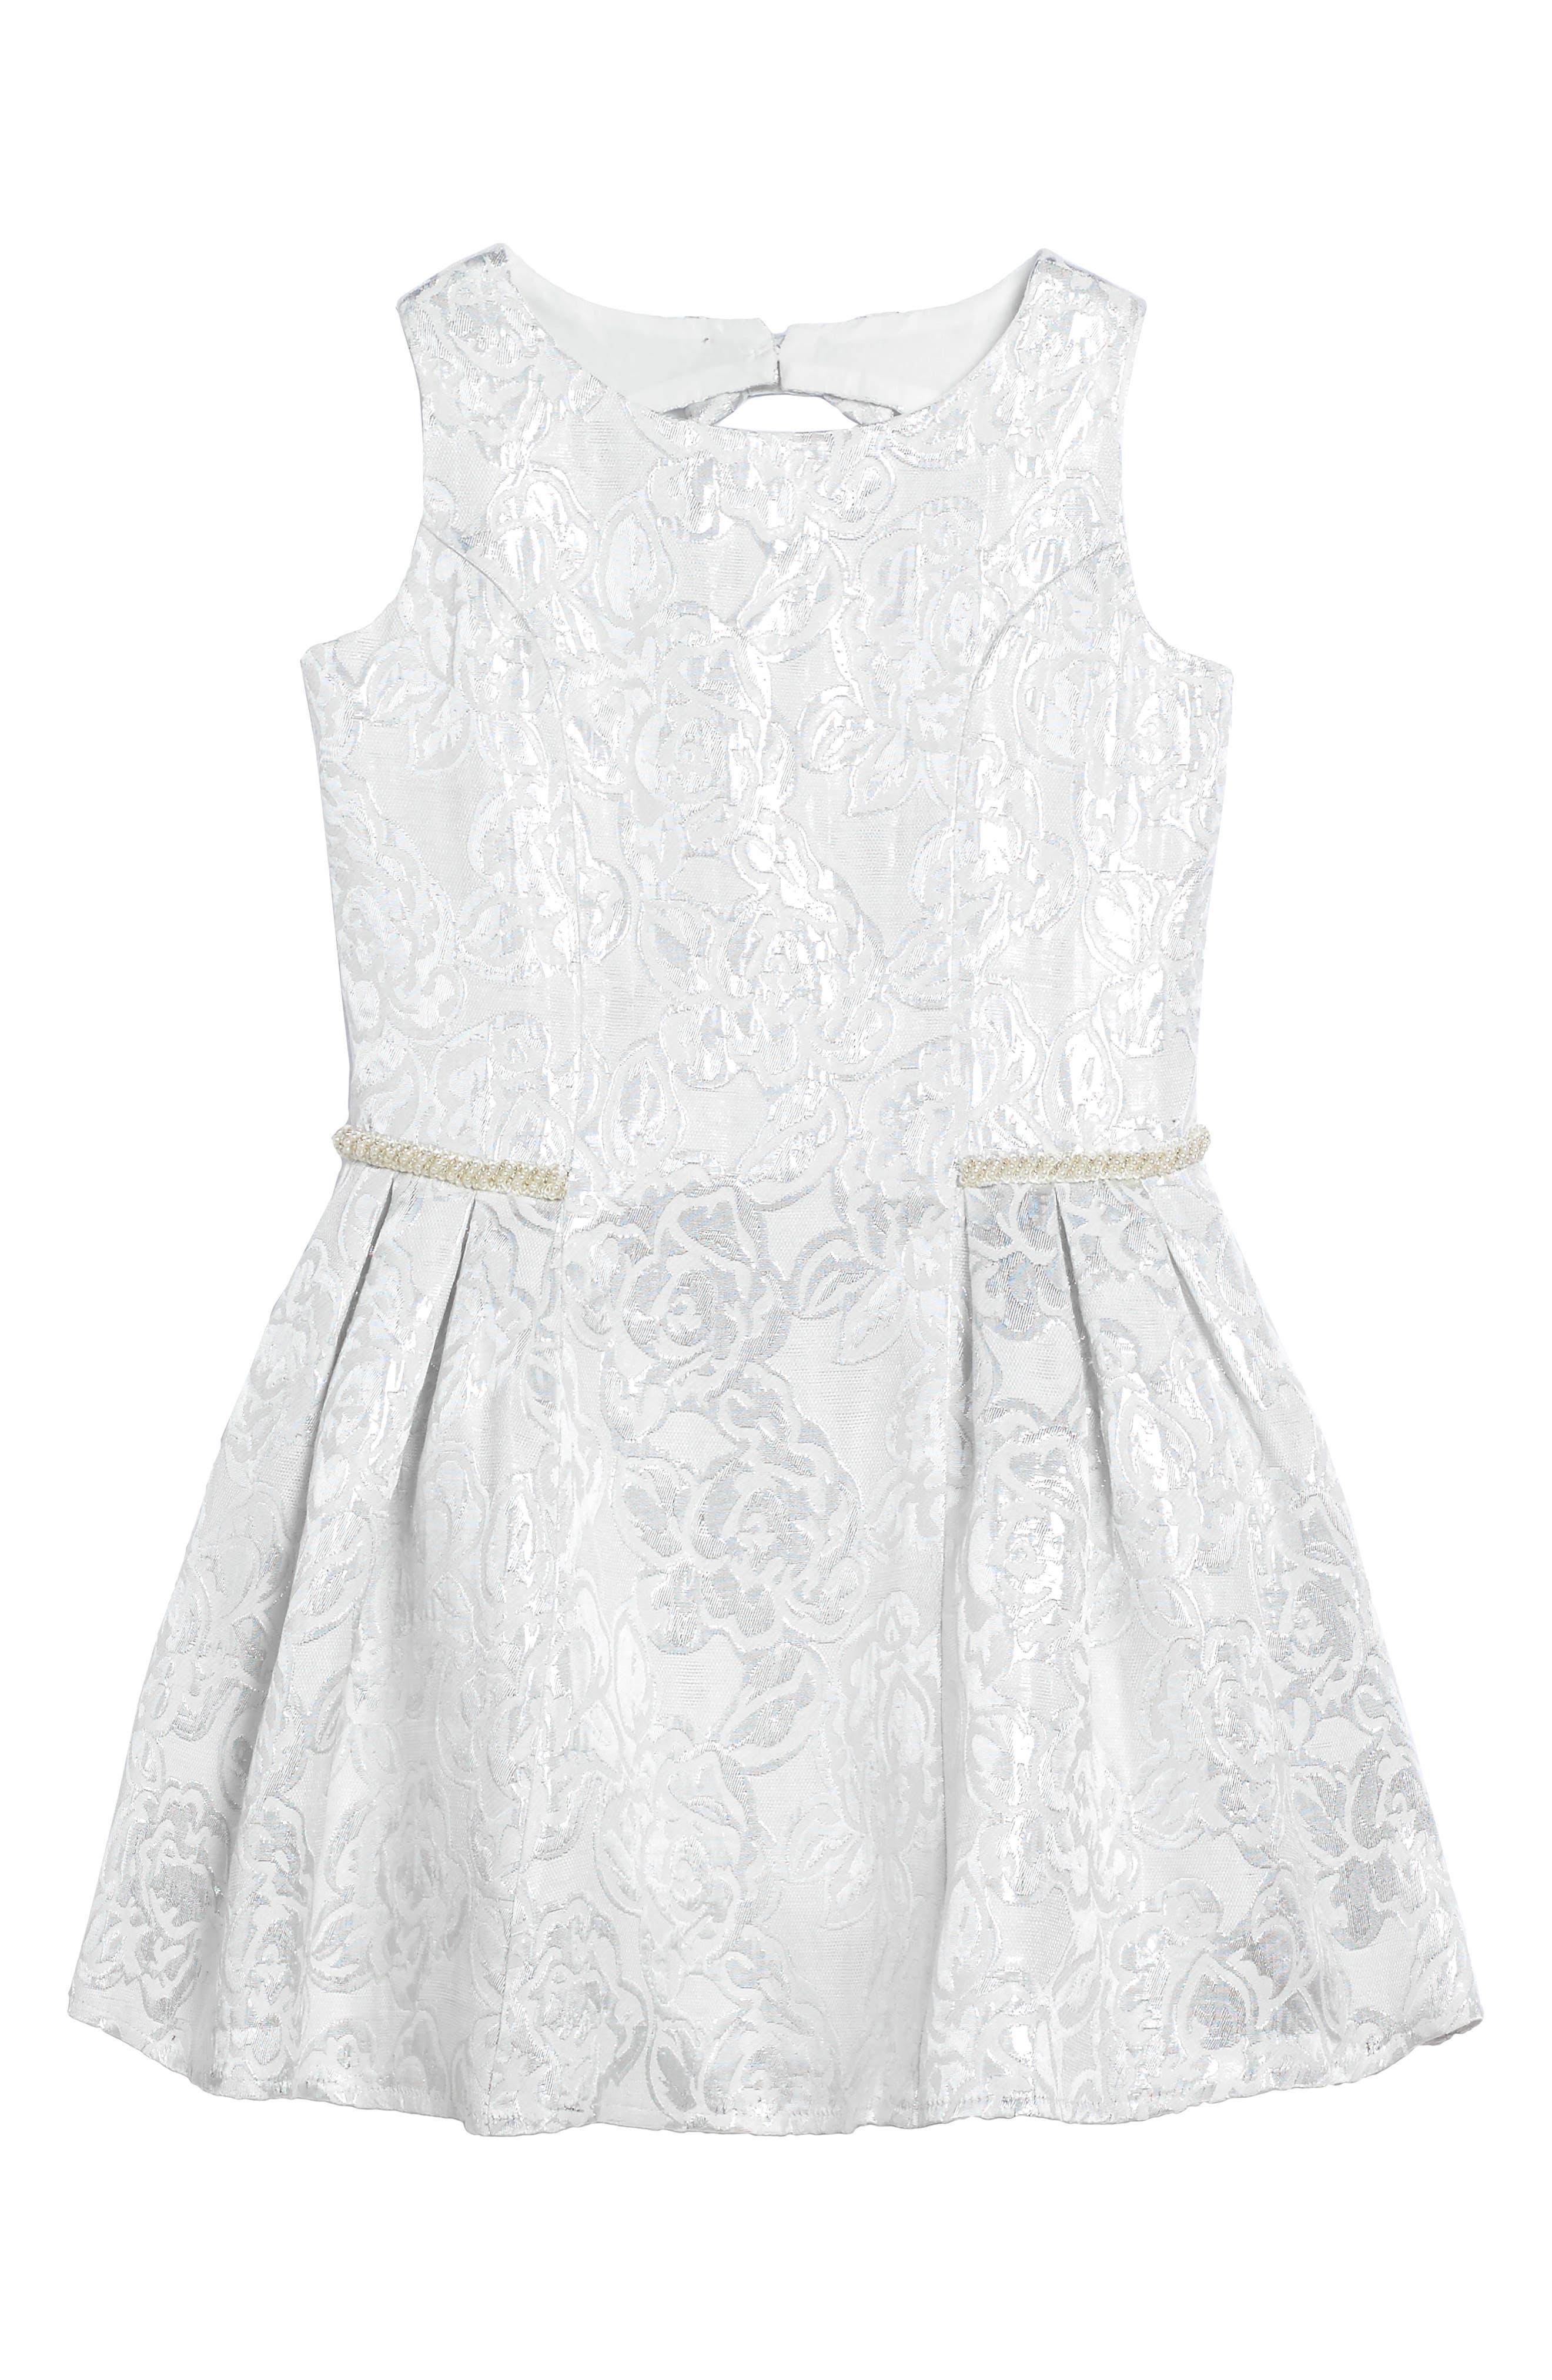 Main Image - Little Angels Princess Embroidered Dress (Toddler Girls & Little Girls)